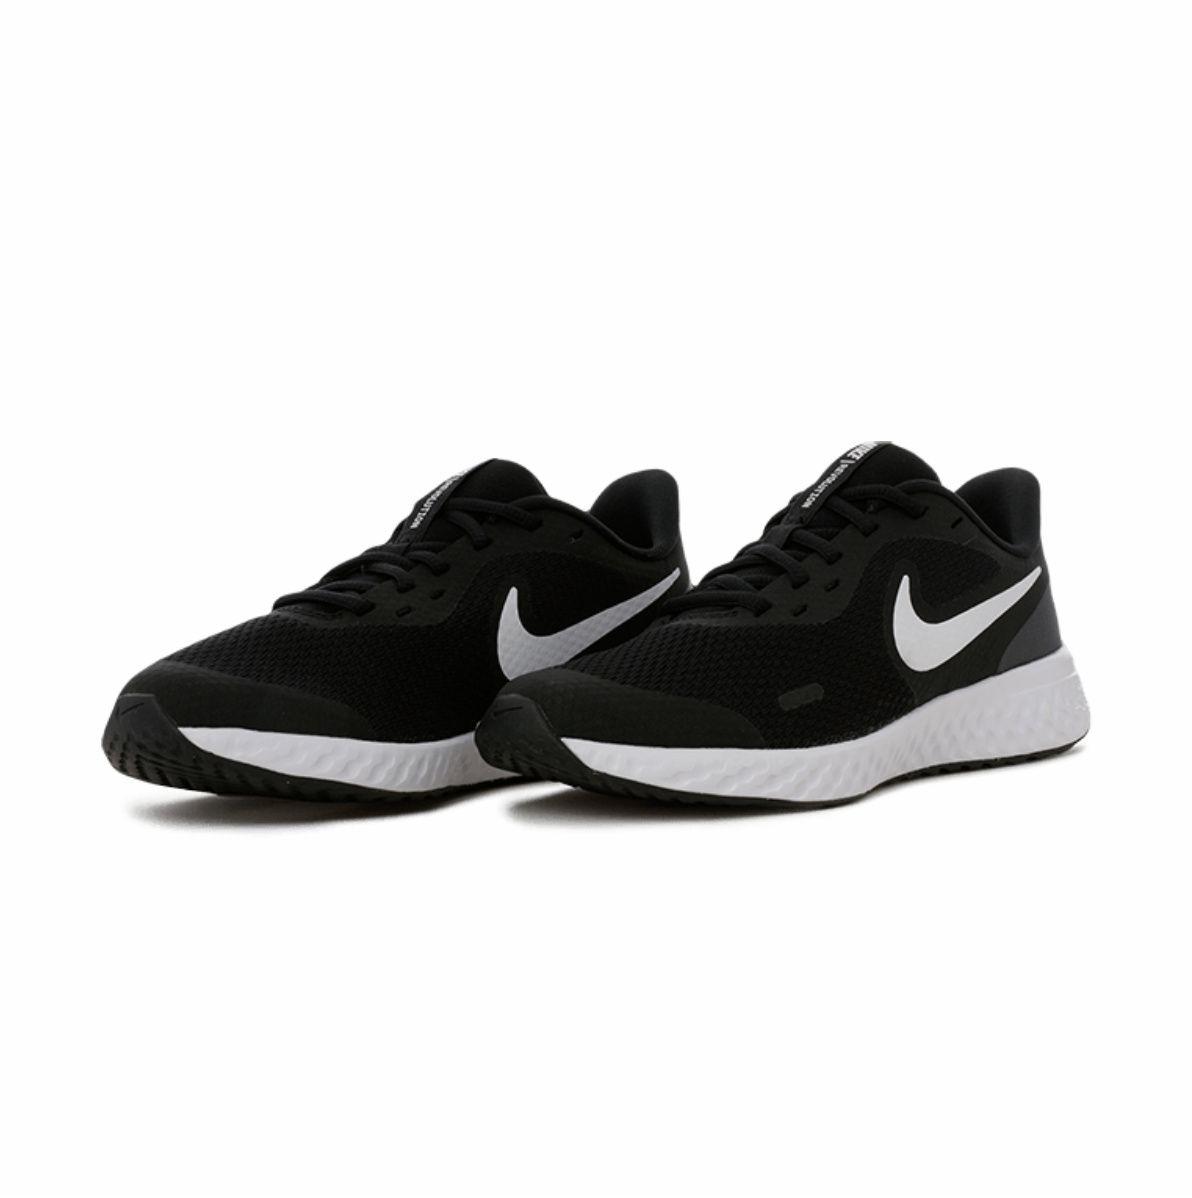 Tenis Nike Revolution 5 Gs Infantil